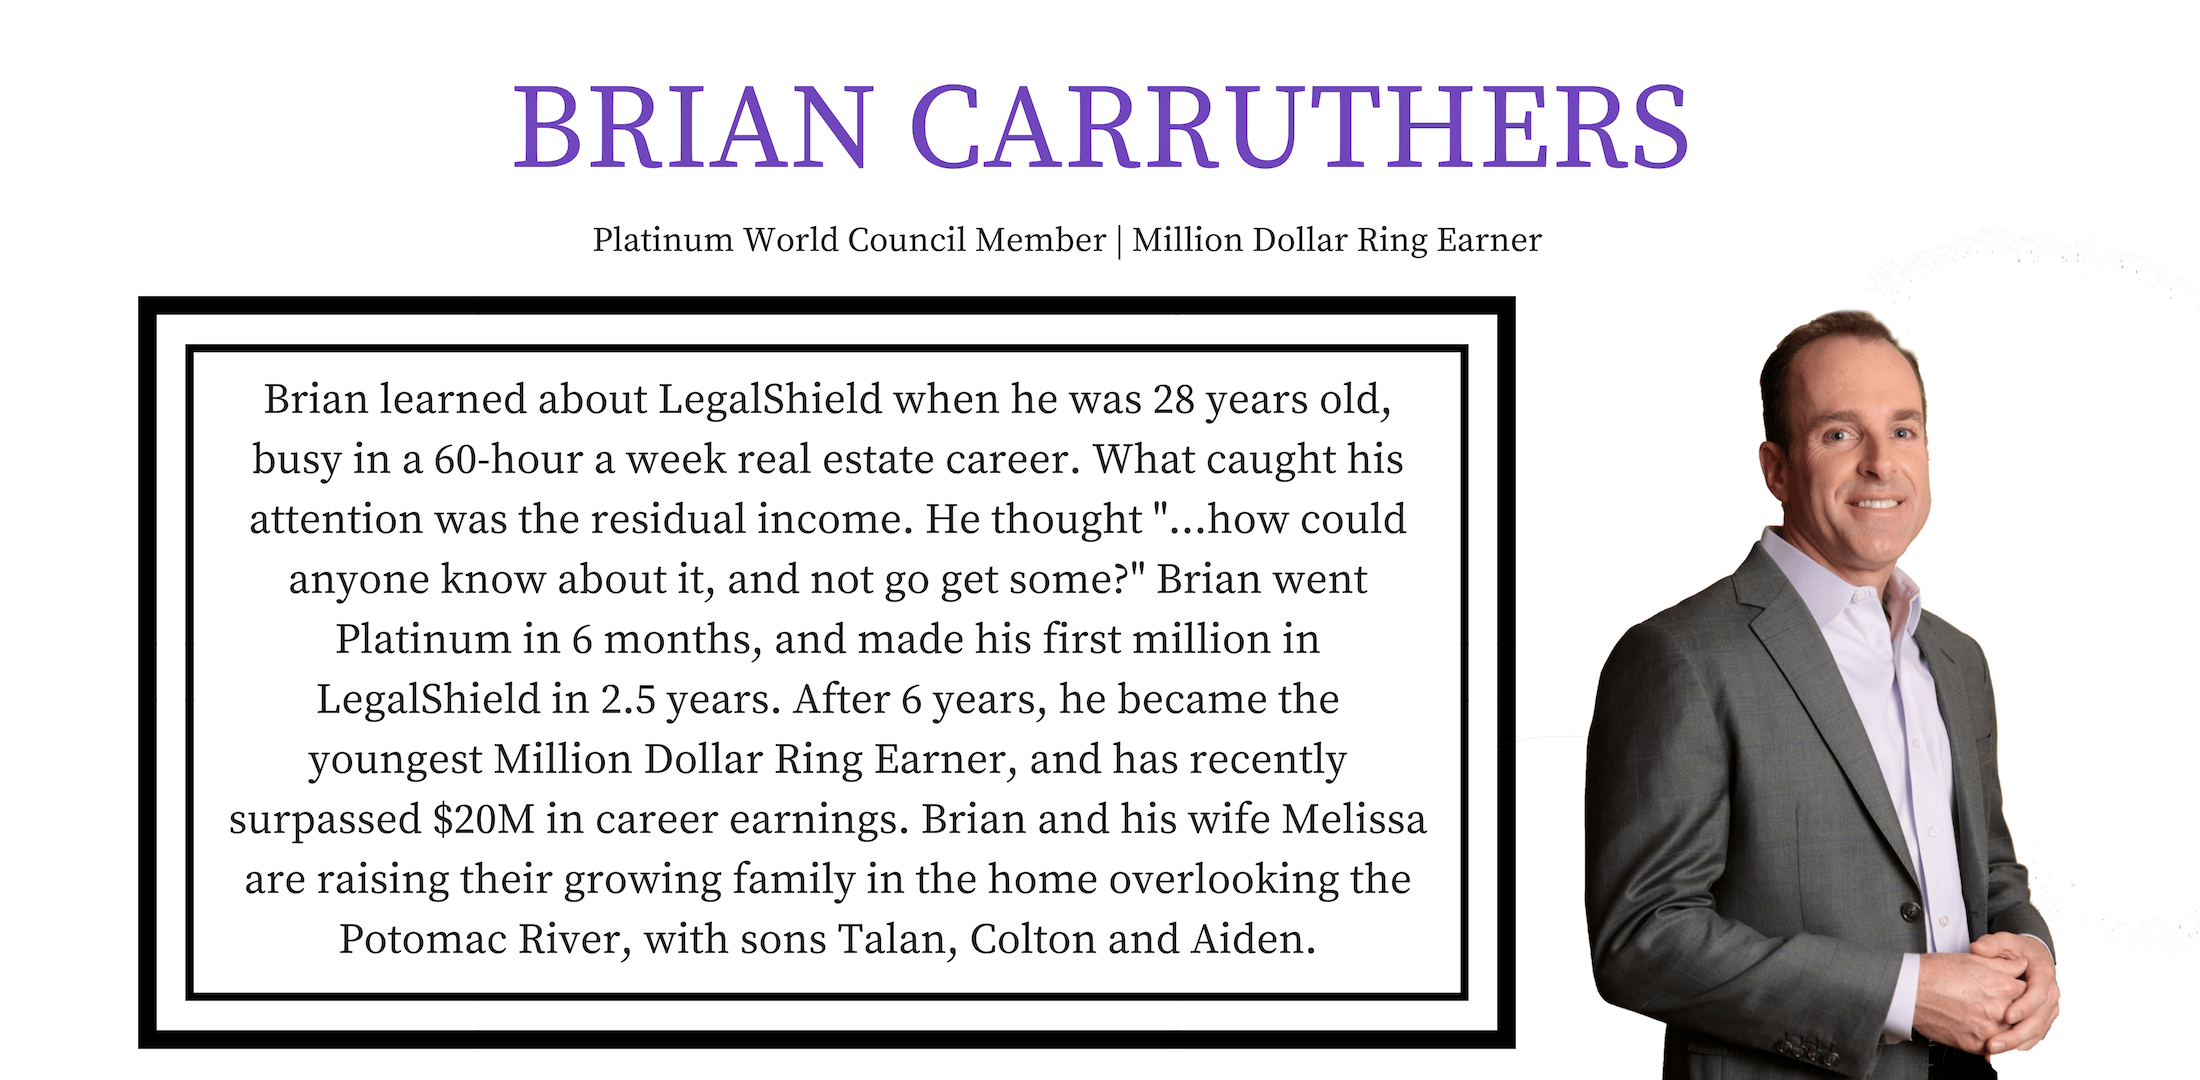 BrianCarruthersFinal